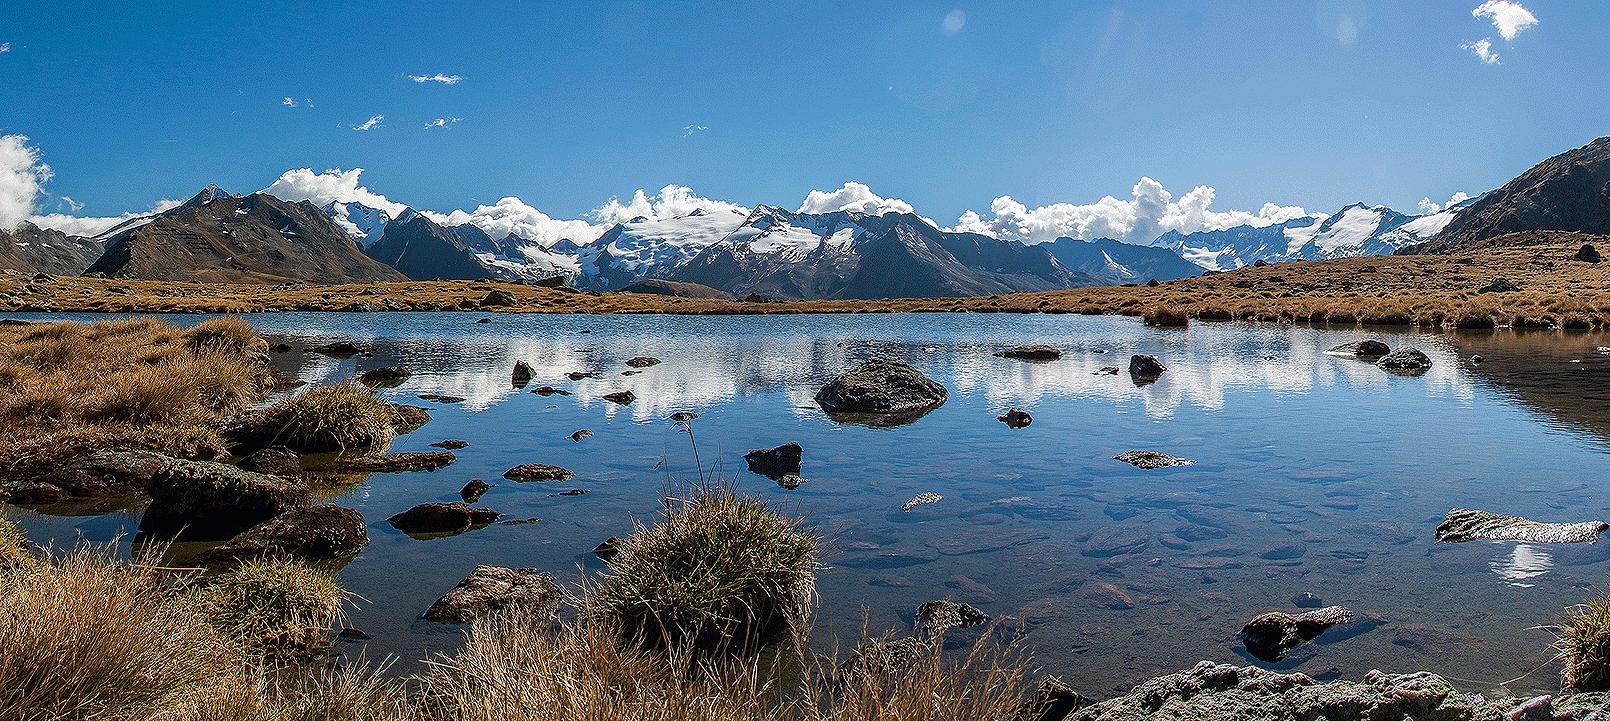 Sommer-See-Berge